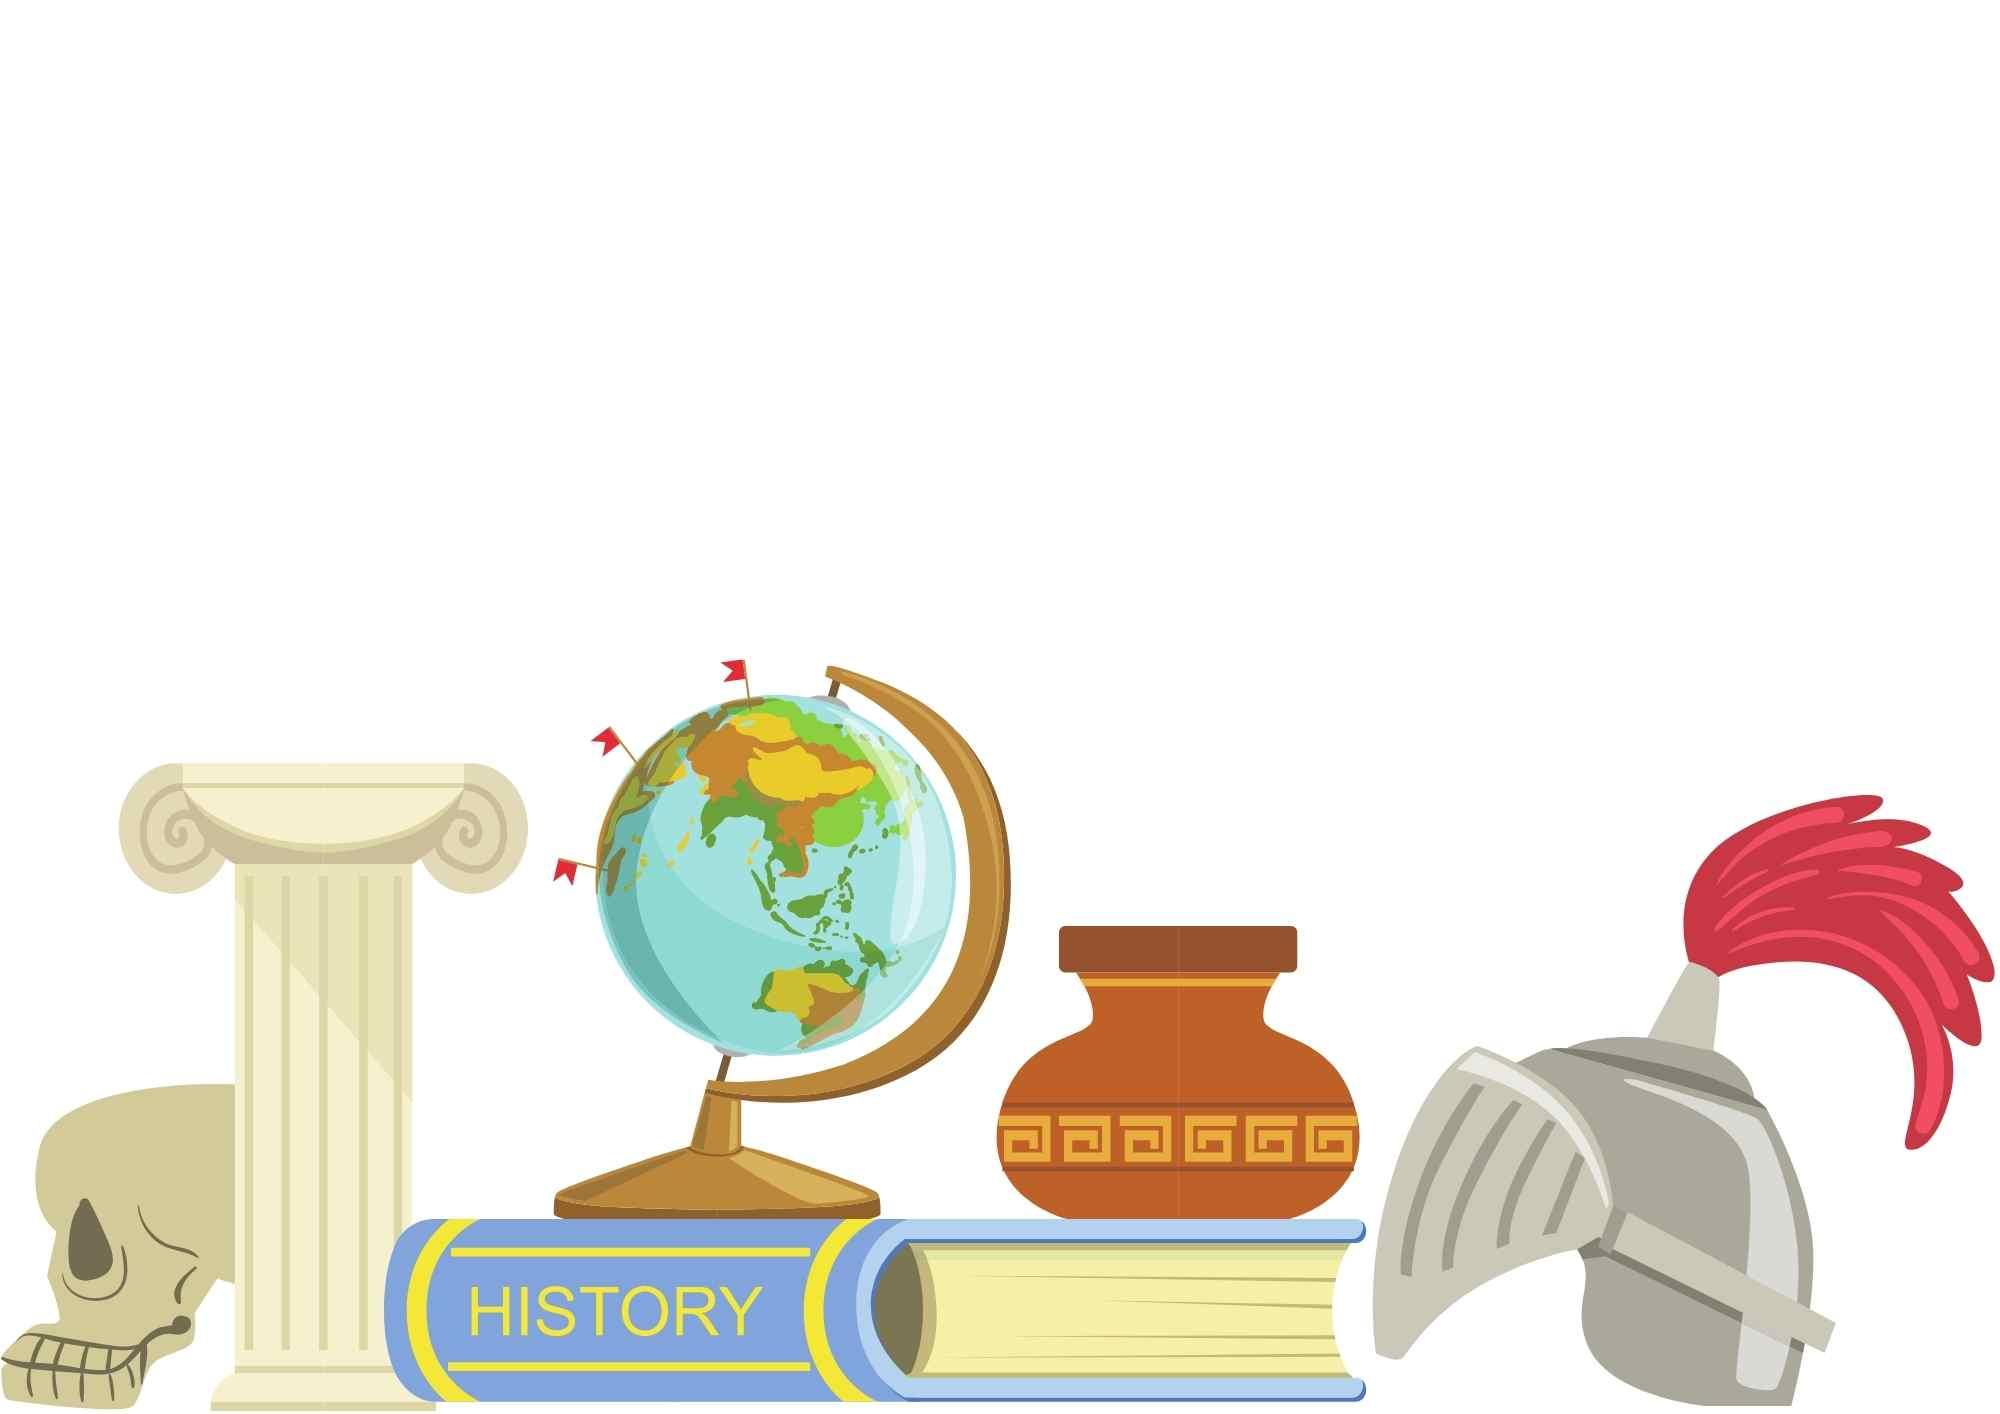 Teaching kids culture through history